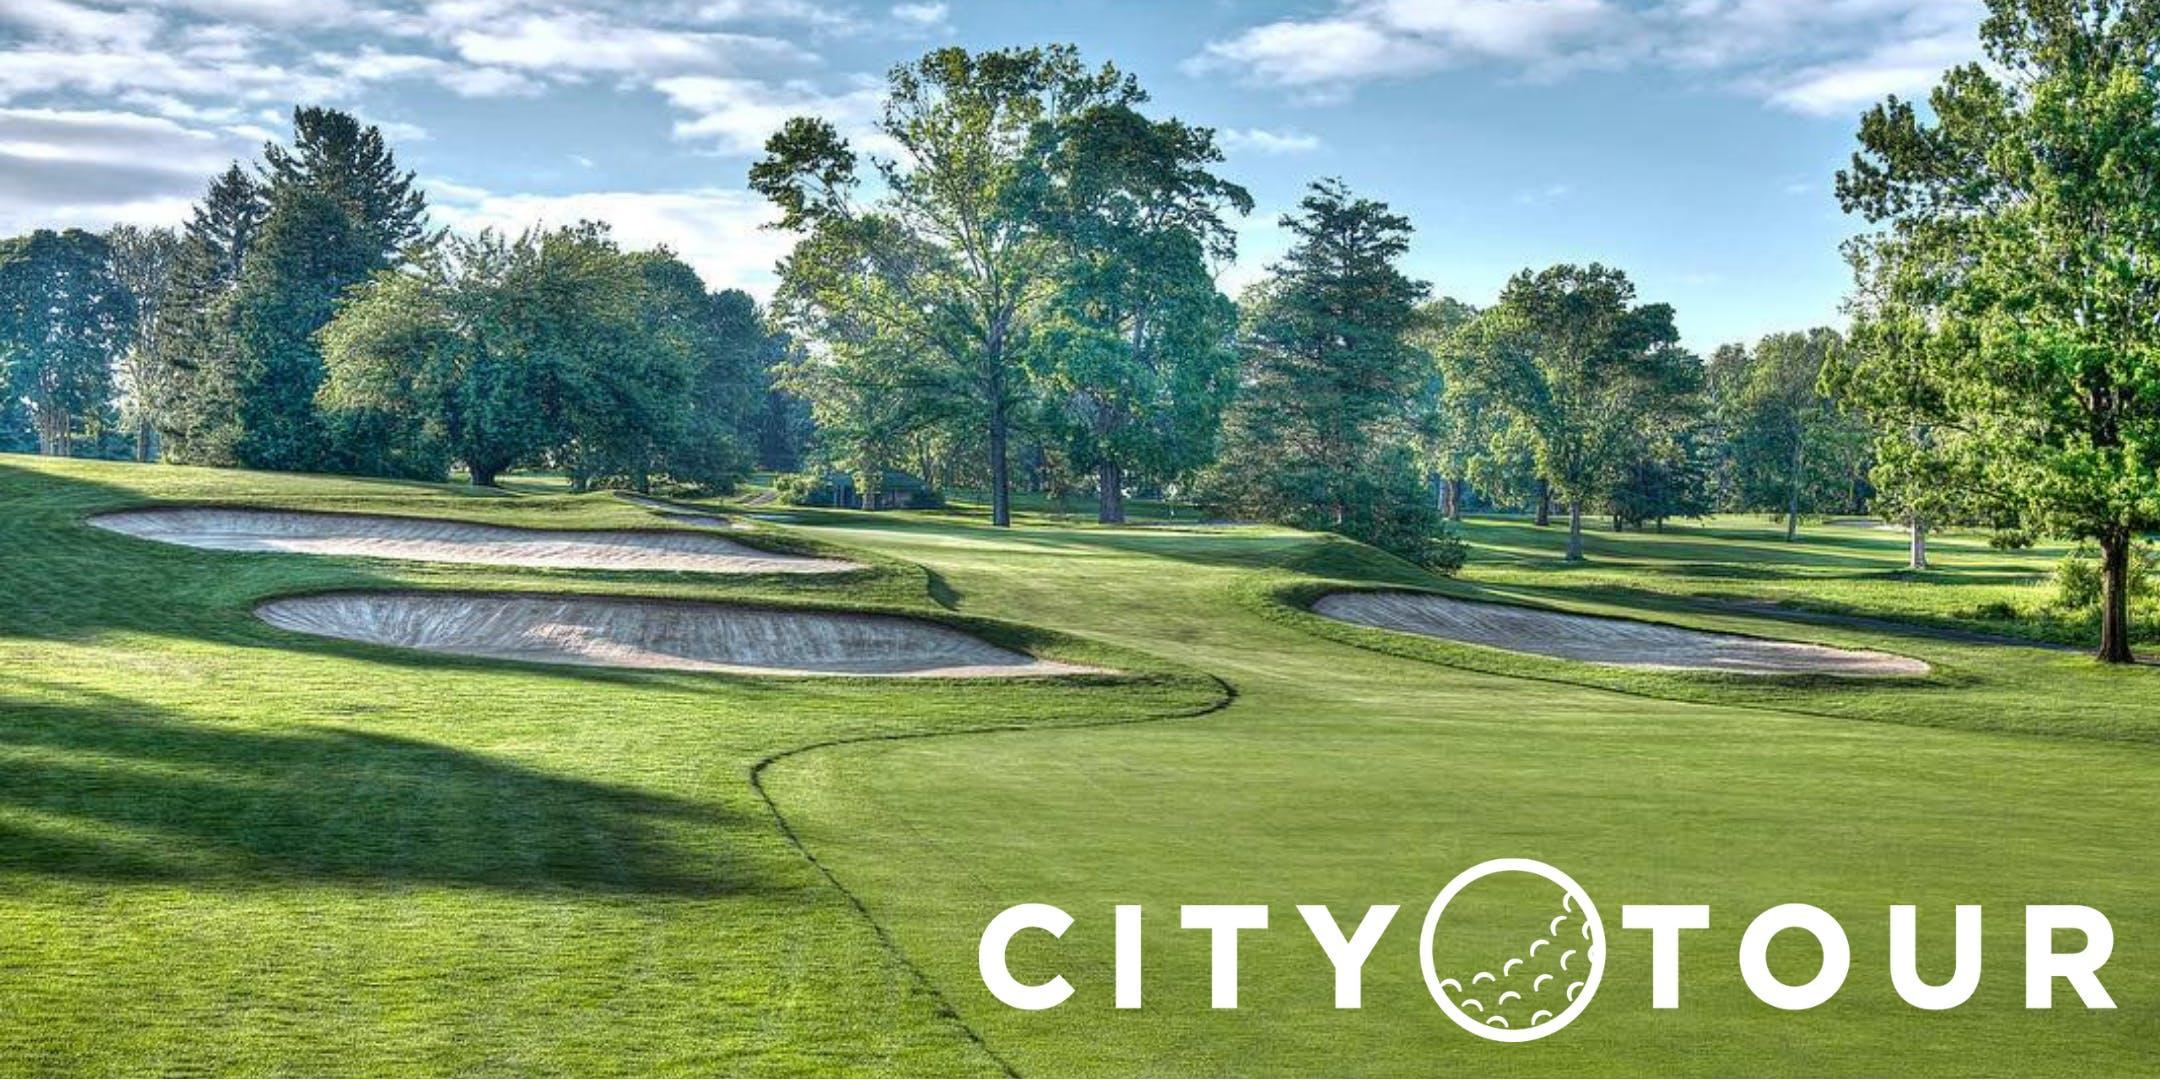 New York City Tour - Centennial Golf Club